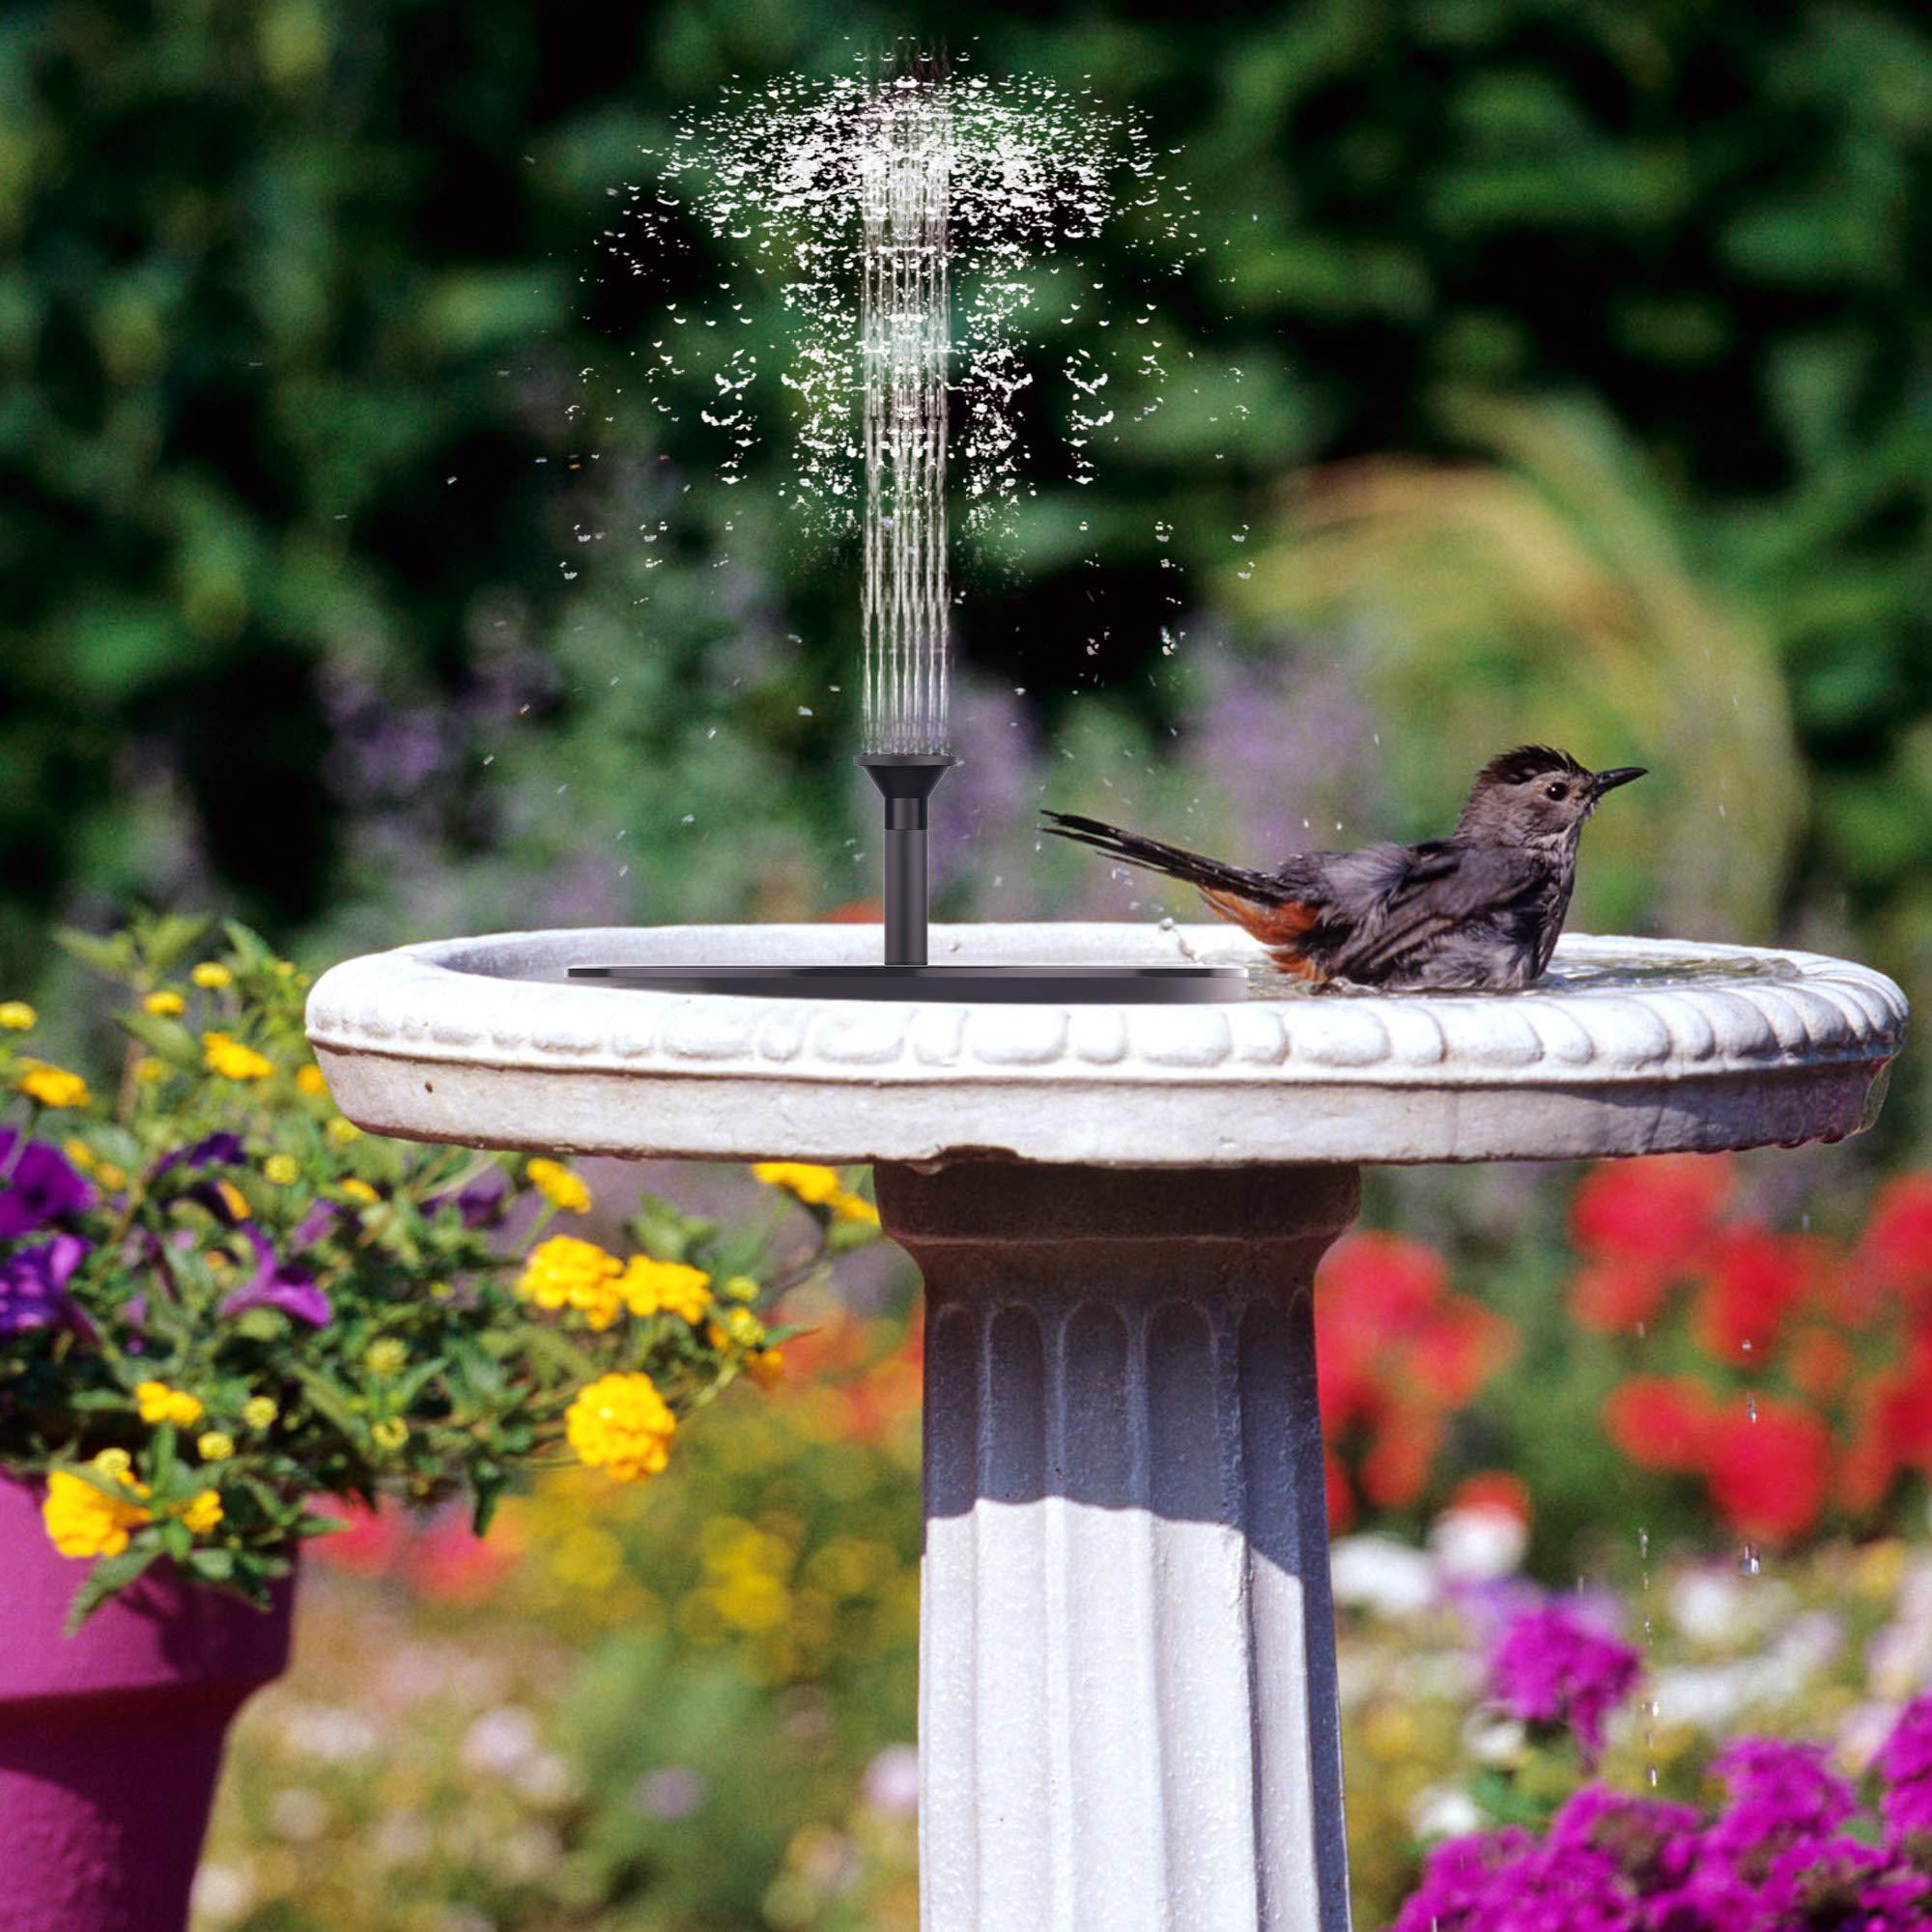 FaayFian 2W Solar Birdbath Fountain Pump, Cordless Solar Bird Attractive Pump for Outdoor Garden Decoration, Watering Submersible Pump for Pond, Swimming Pool, Fish Tank by FaayFian (Image #2)